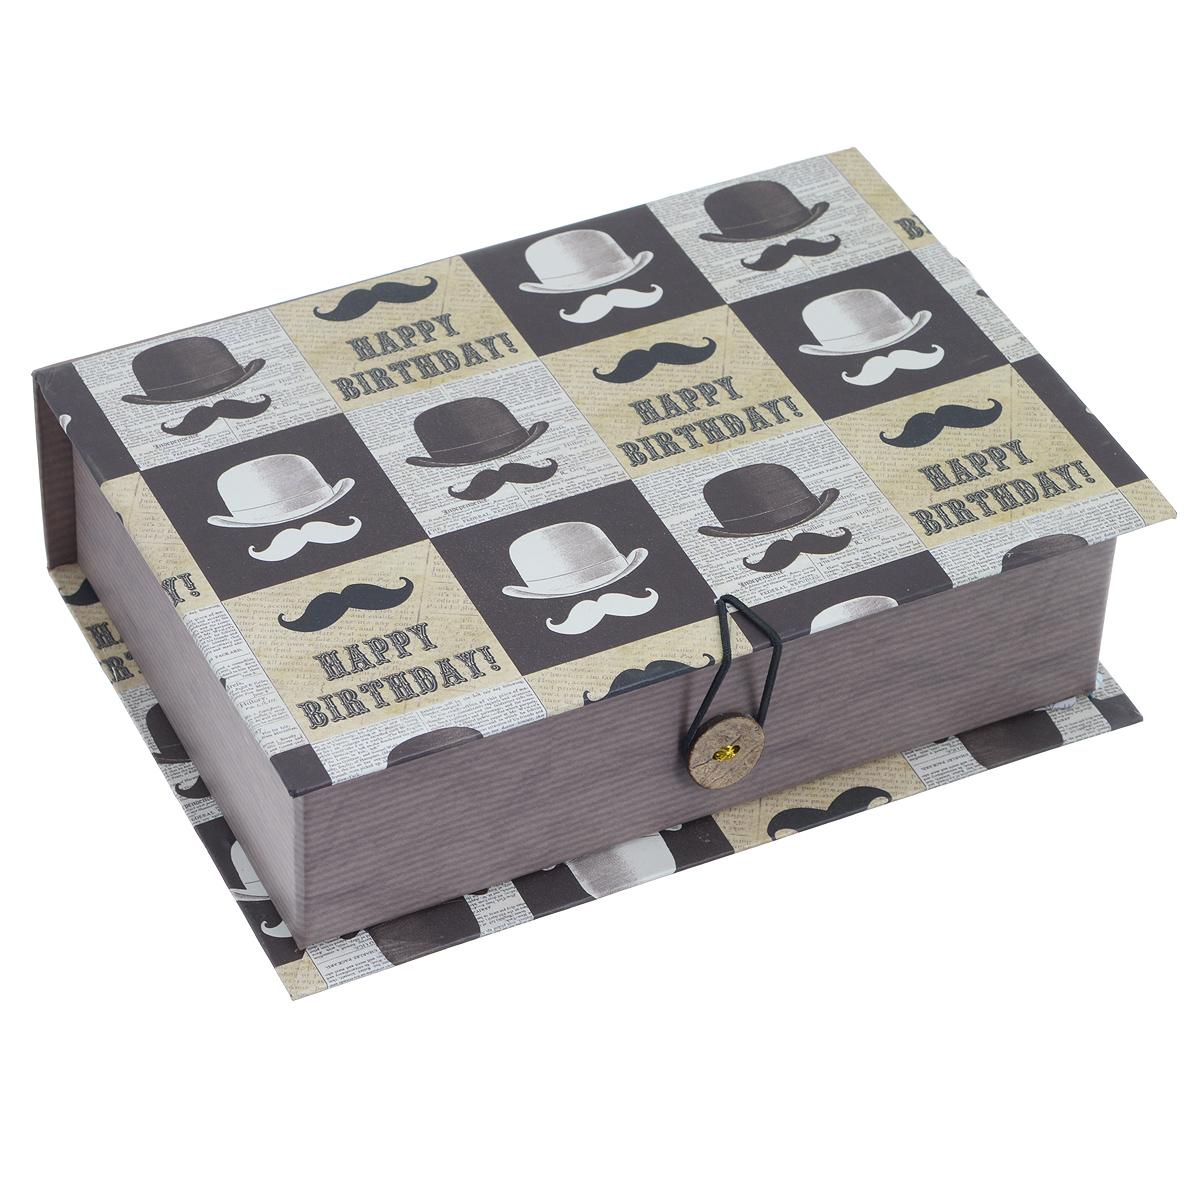 "Феникс-Презент Подарочная коробка ""Усы и шляпа"", 18 х 12 х 5 см 39462"